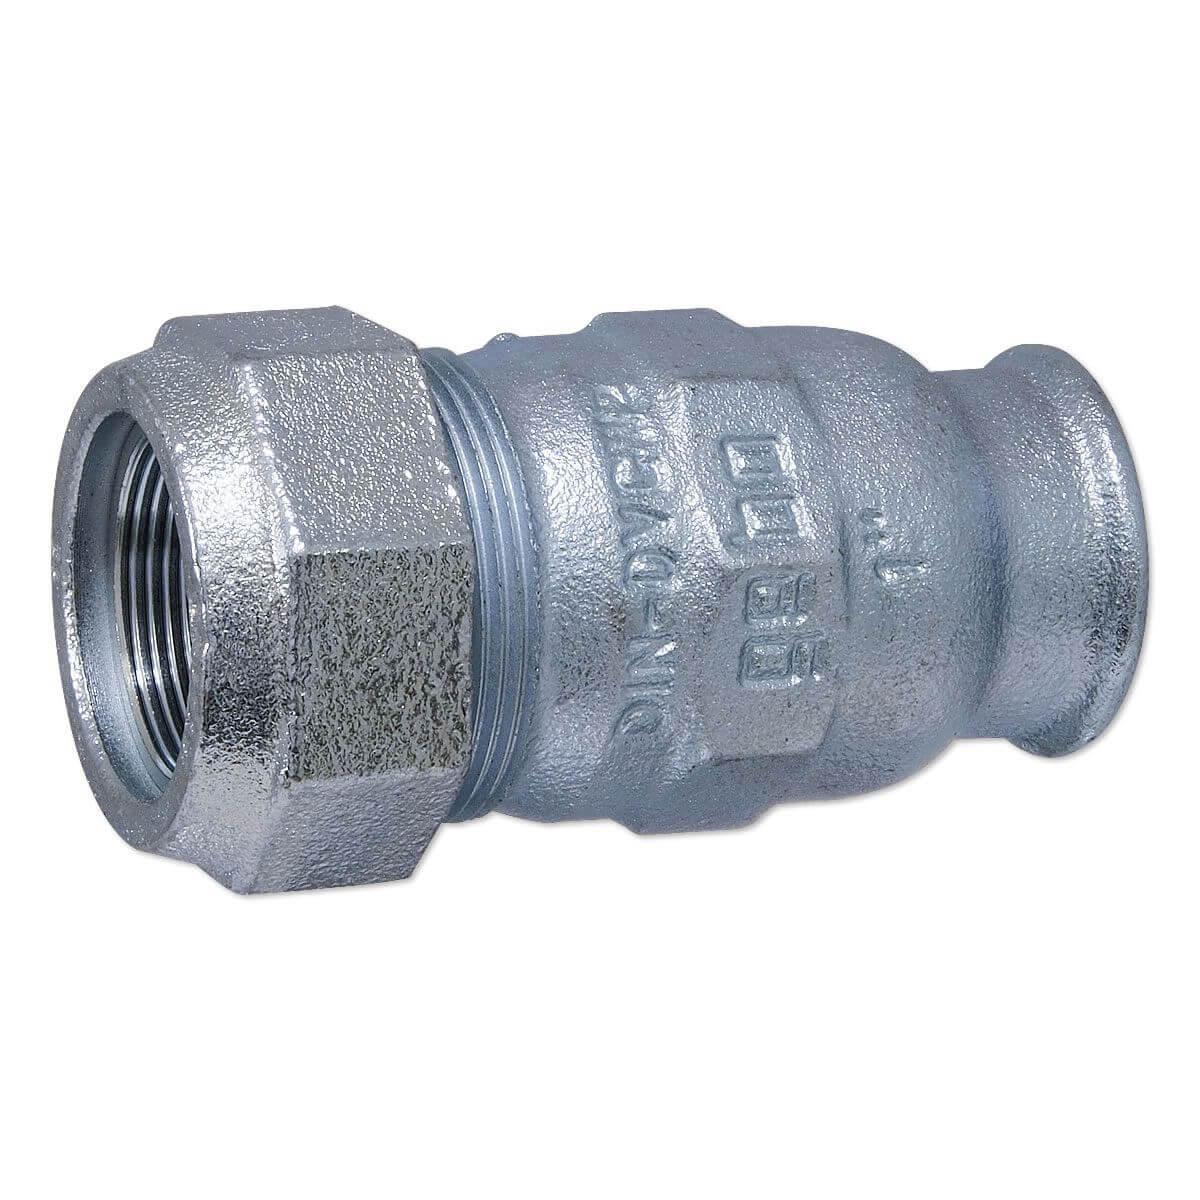 GEBO Kunststoff-Klemmverbinder T-Stück Mittelabgang reduziert DVGW geprüft